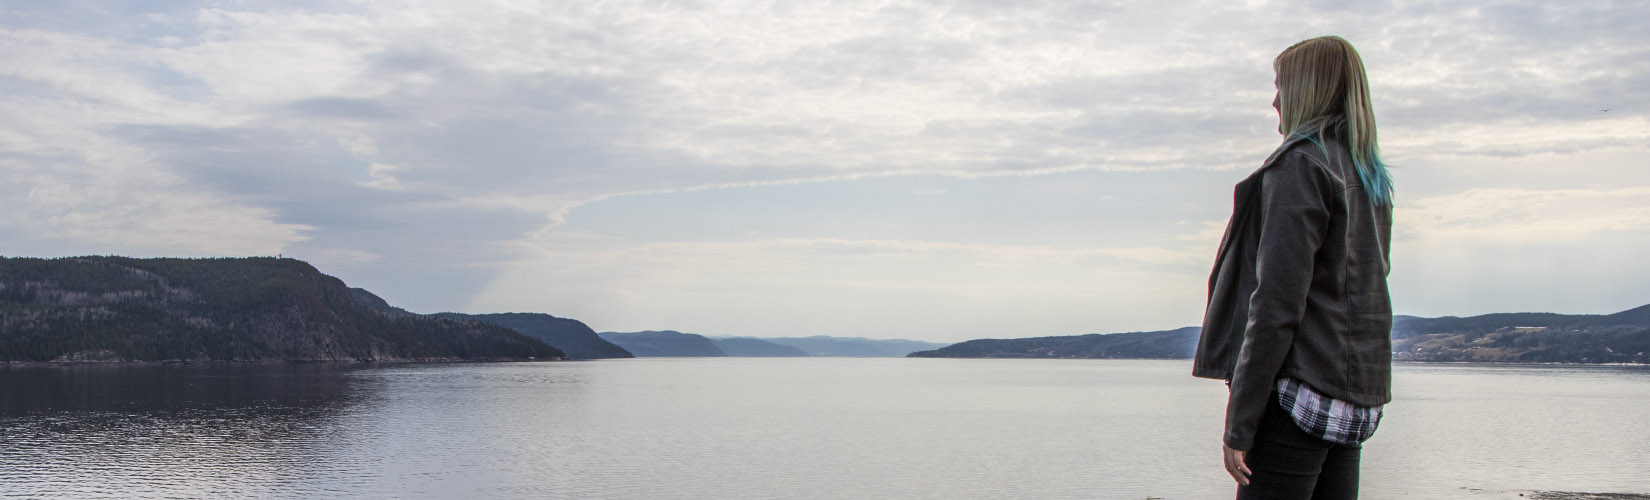 Saguenay Lac-Saint-Jean, A Destination for Everyone :: I've Been Bit! A Travel Blog